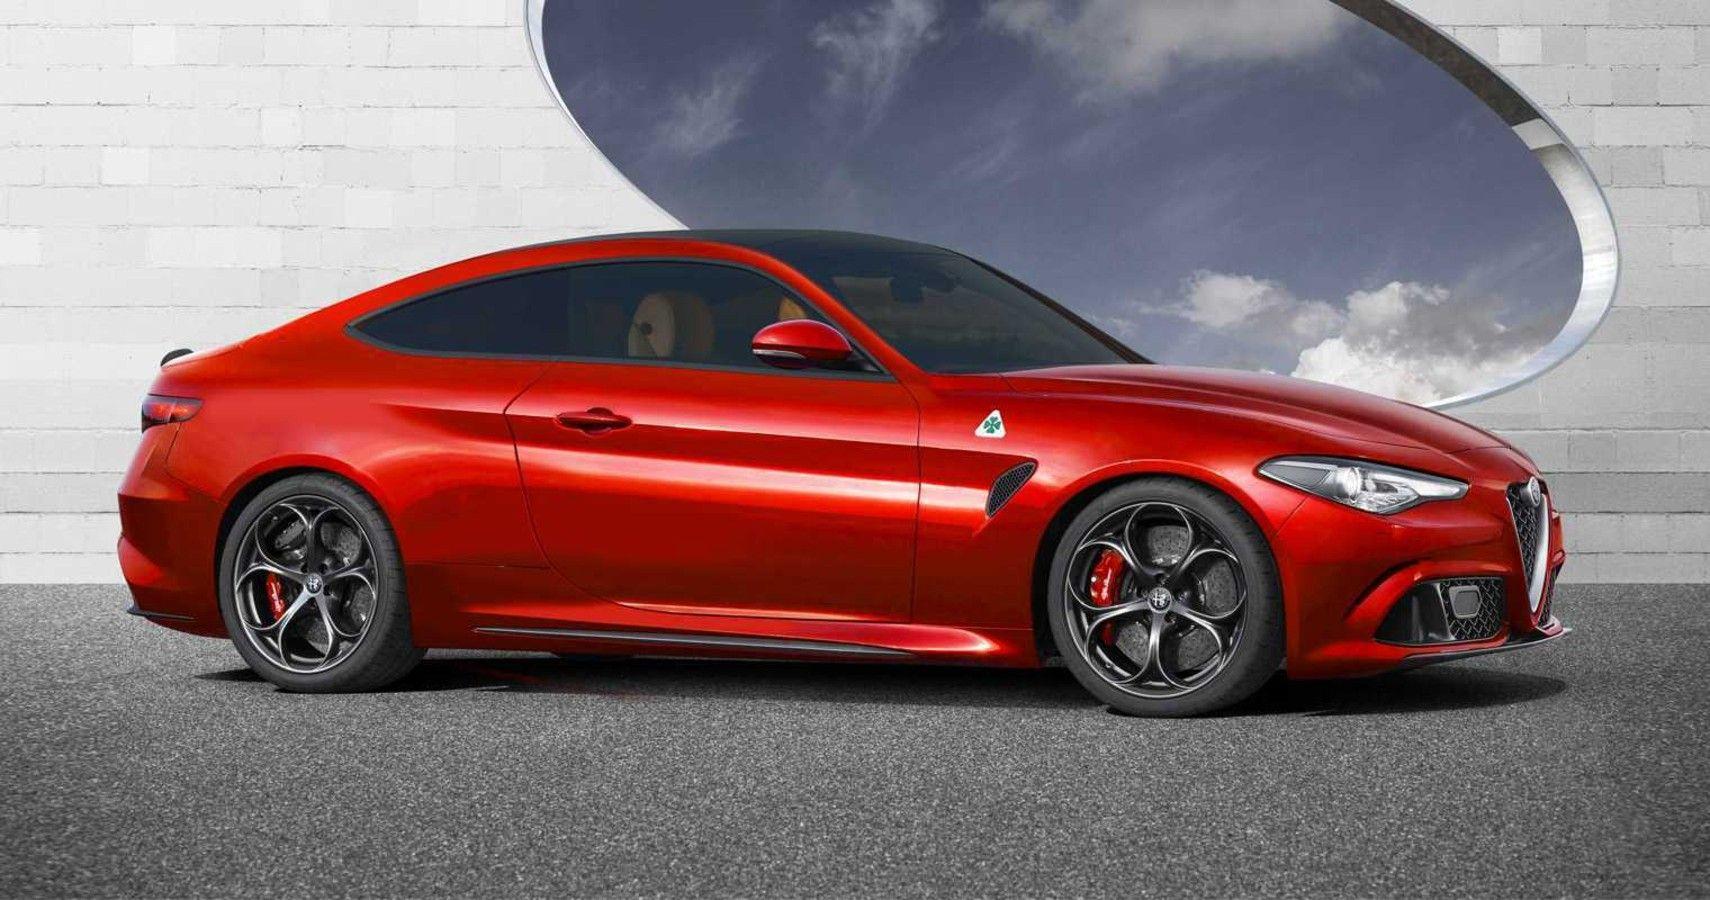 2021 Alfa Romeo GTV: What We Know So Far